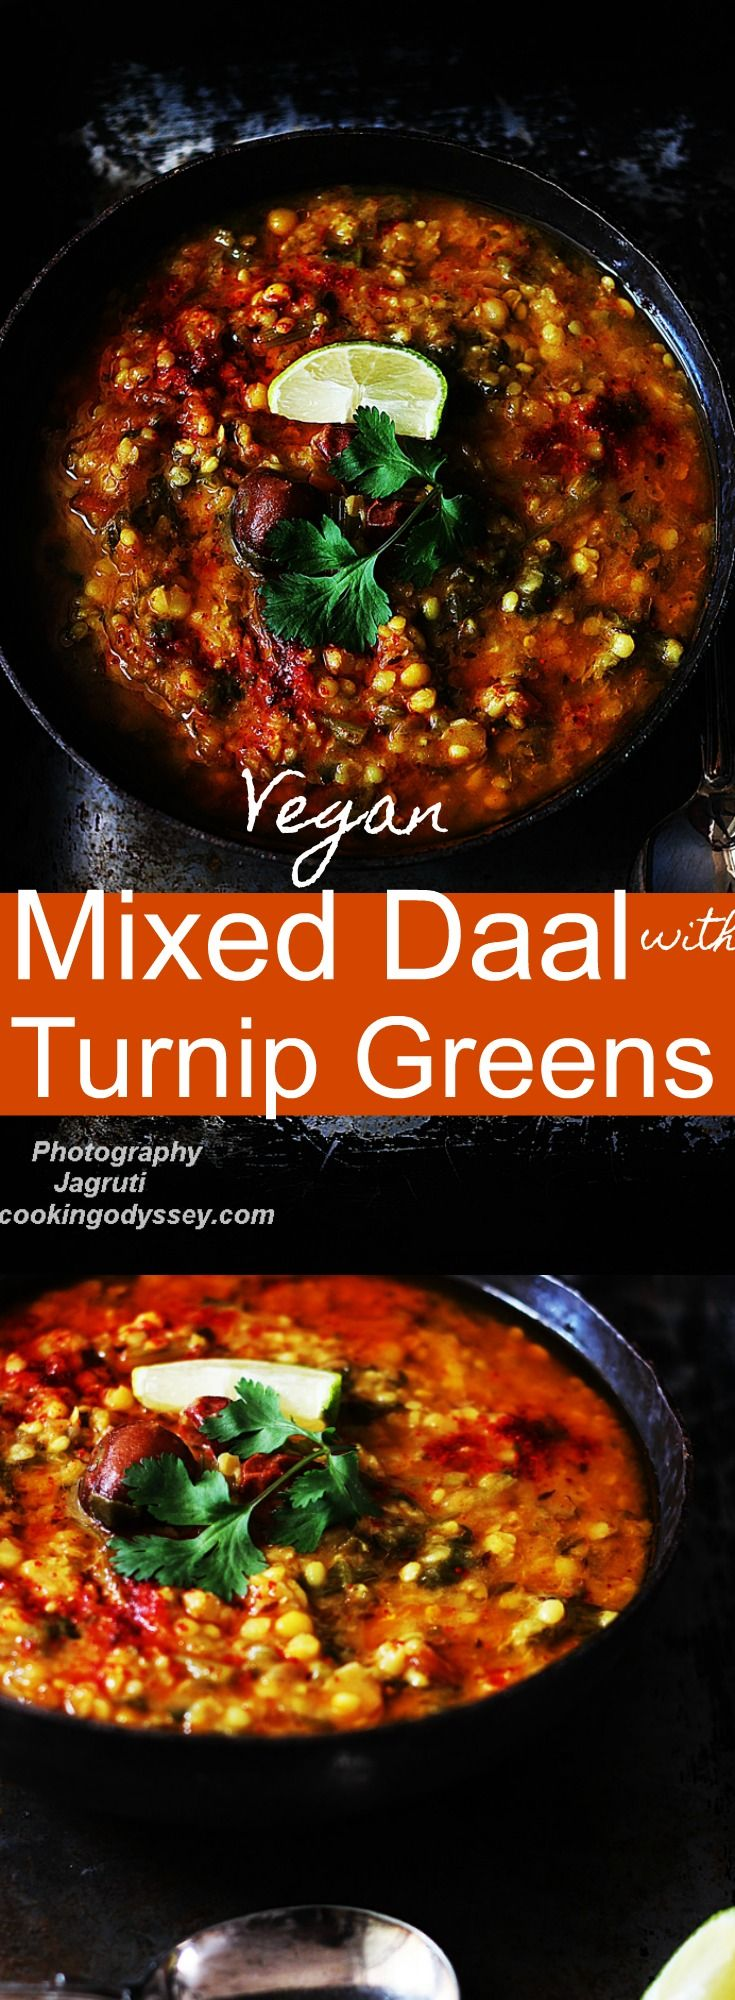 Mixed daal with Turnip greens-Shalgham ke Patte vali Daal